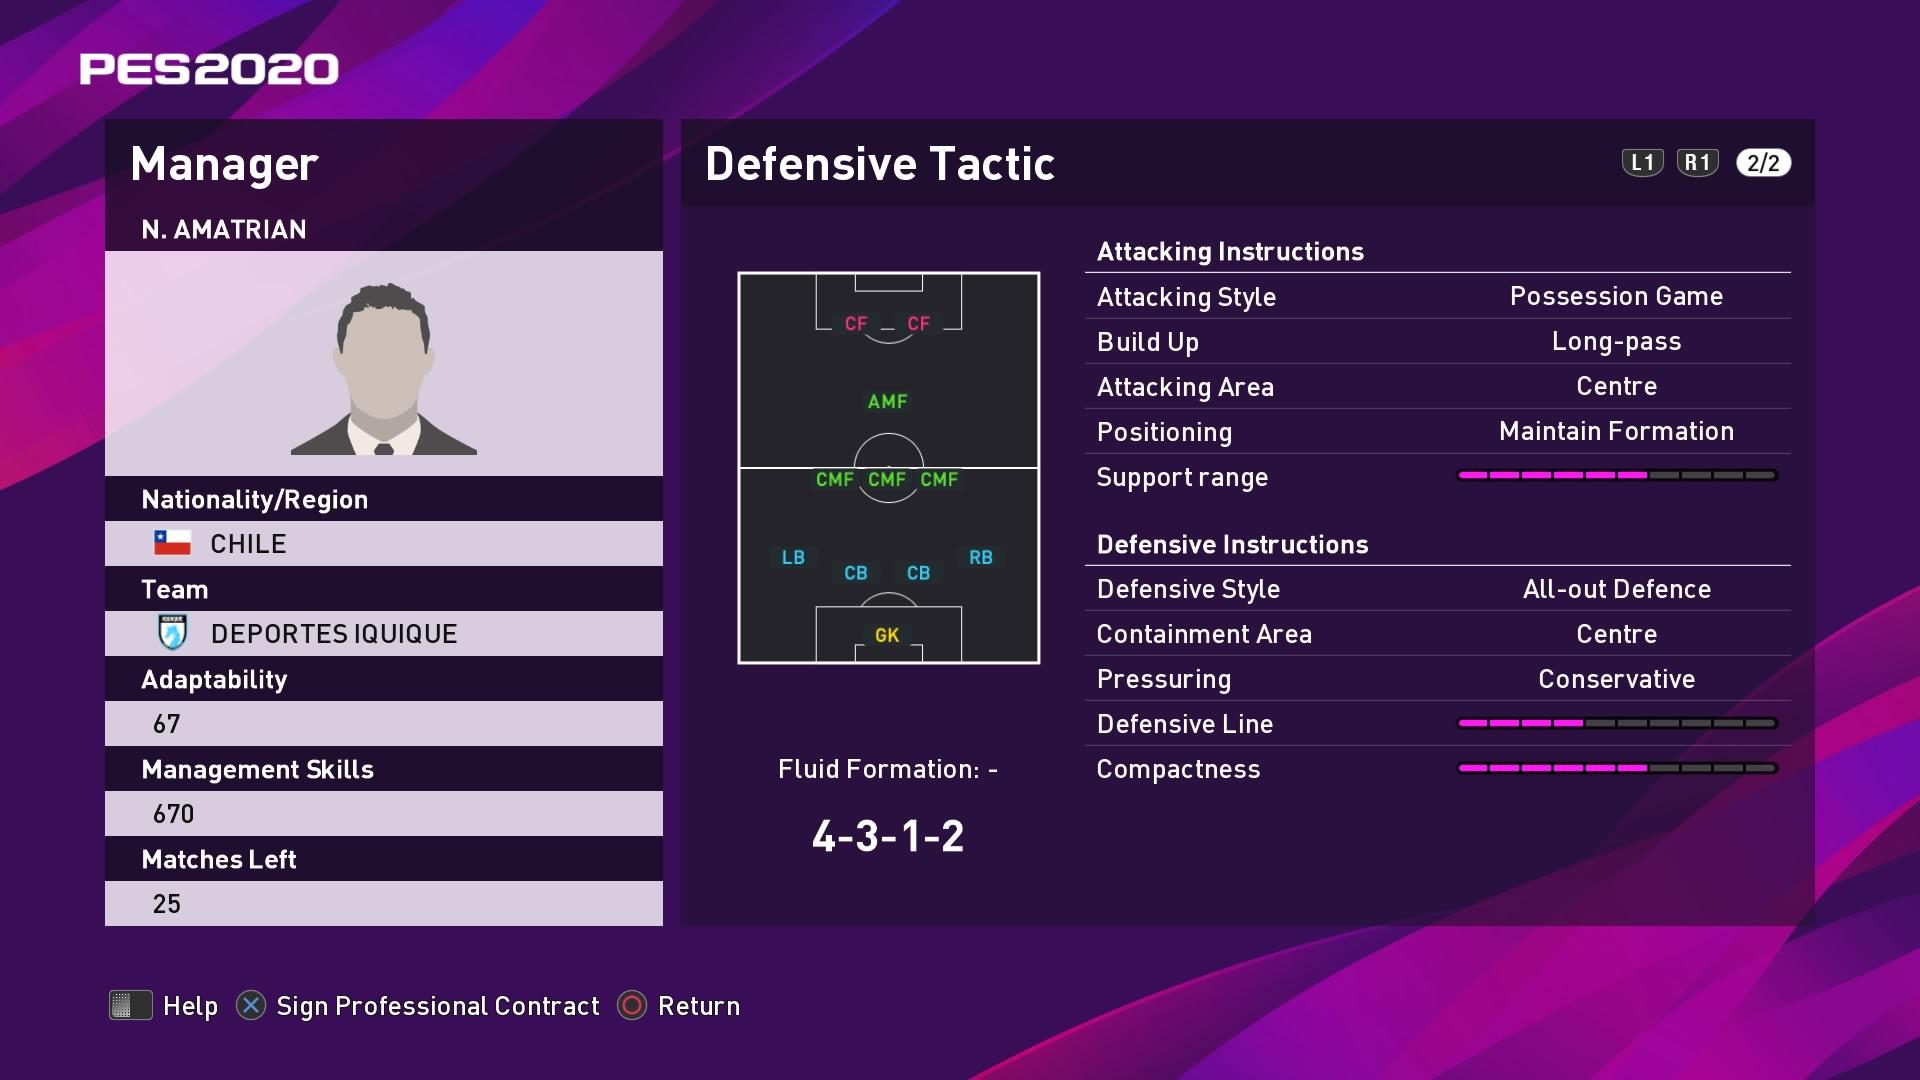 N. Amatrian (Jaime Vera) Defensive Tactic in PES 2020 myClub